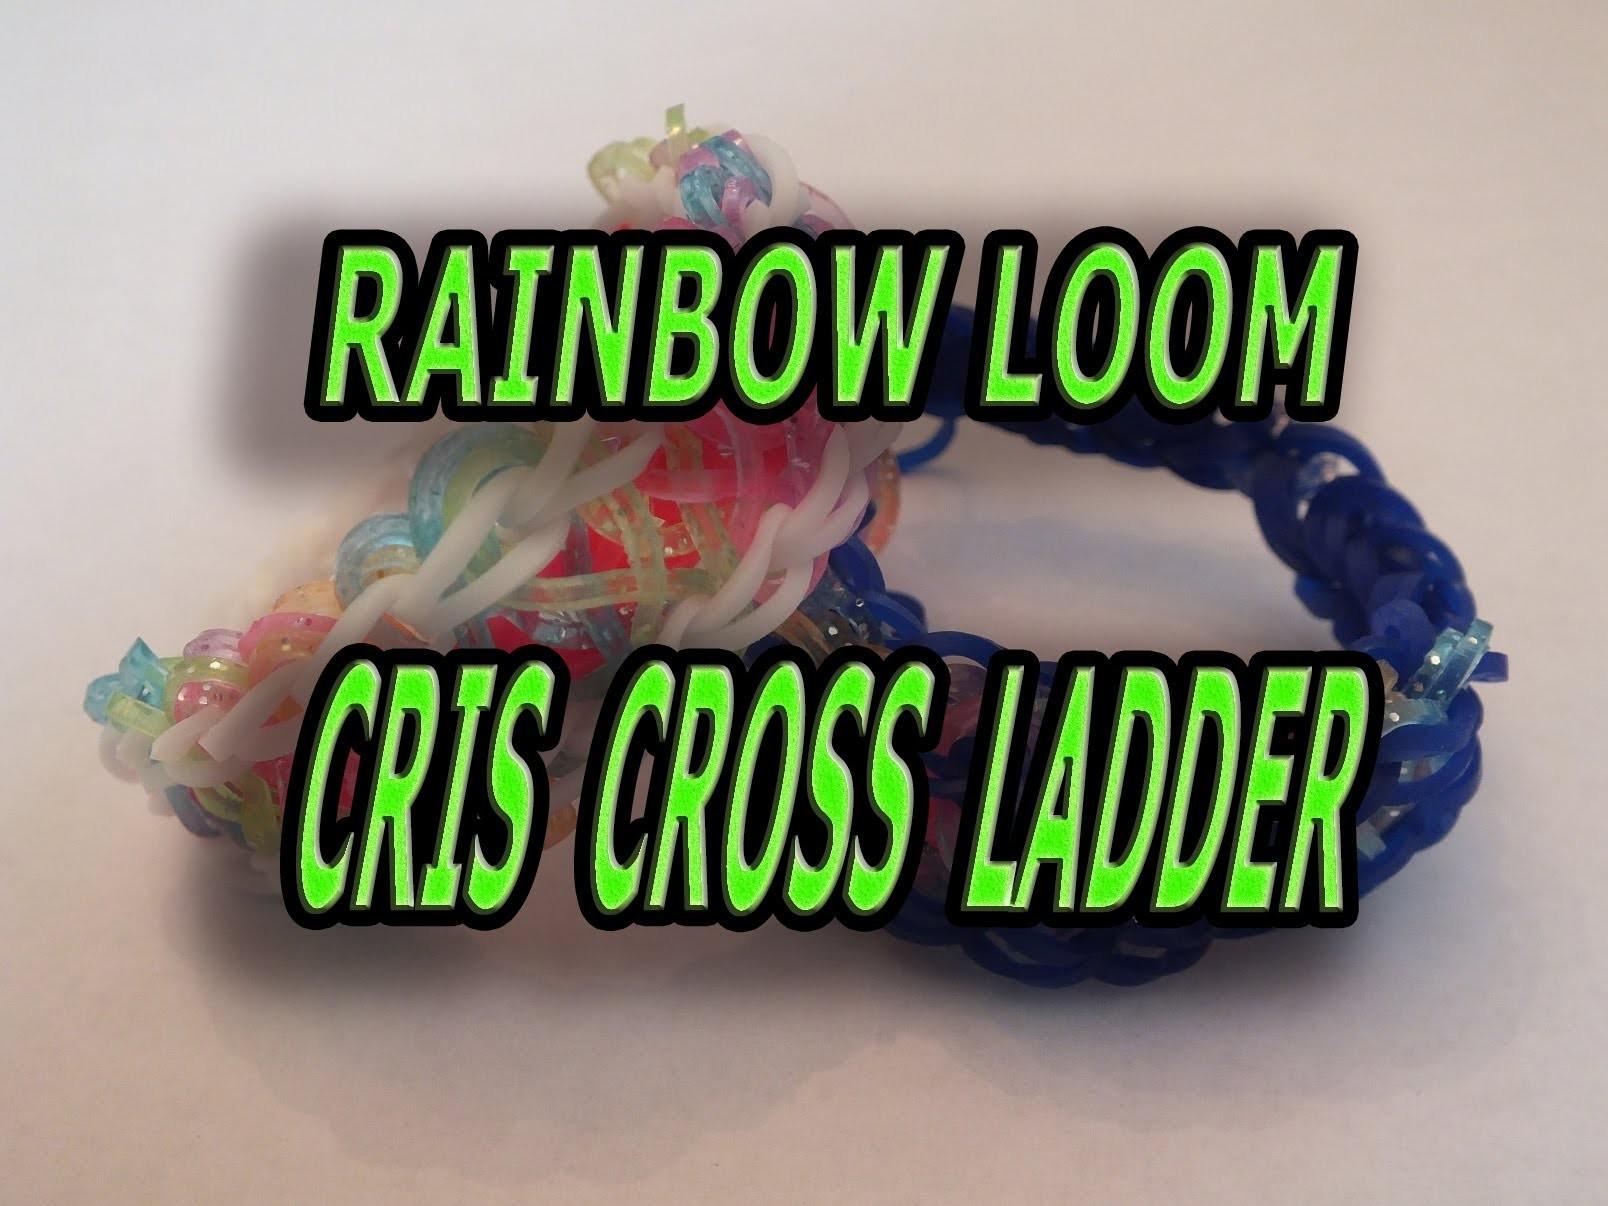 New Design, RAINBOW LOOM, CRIS CROSS LADDER, How to make